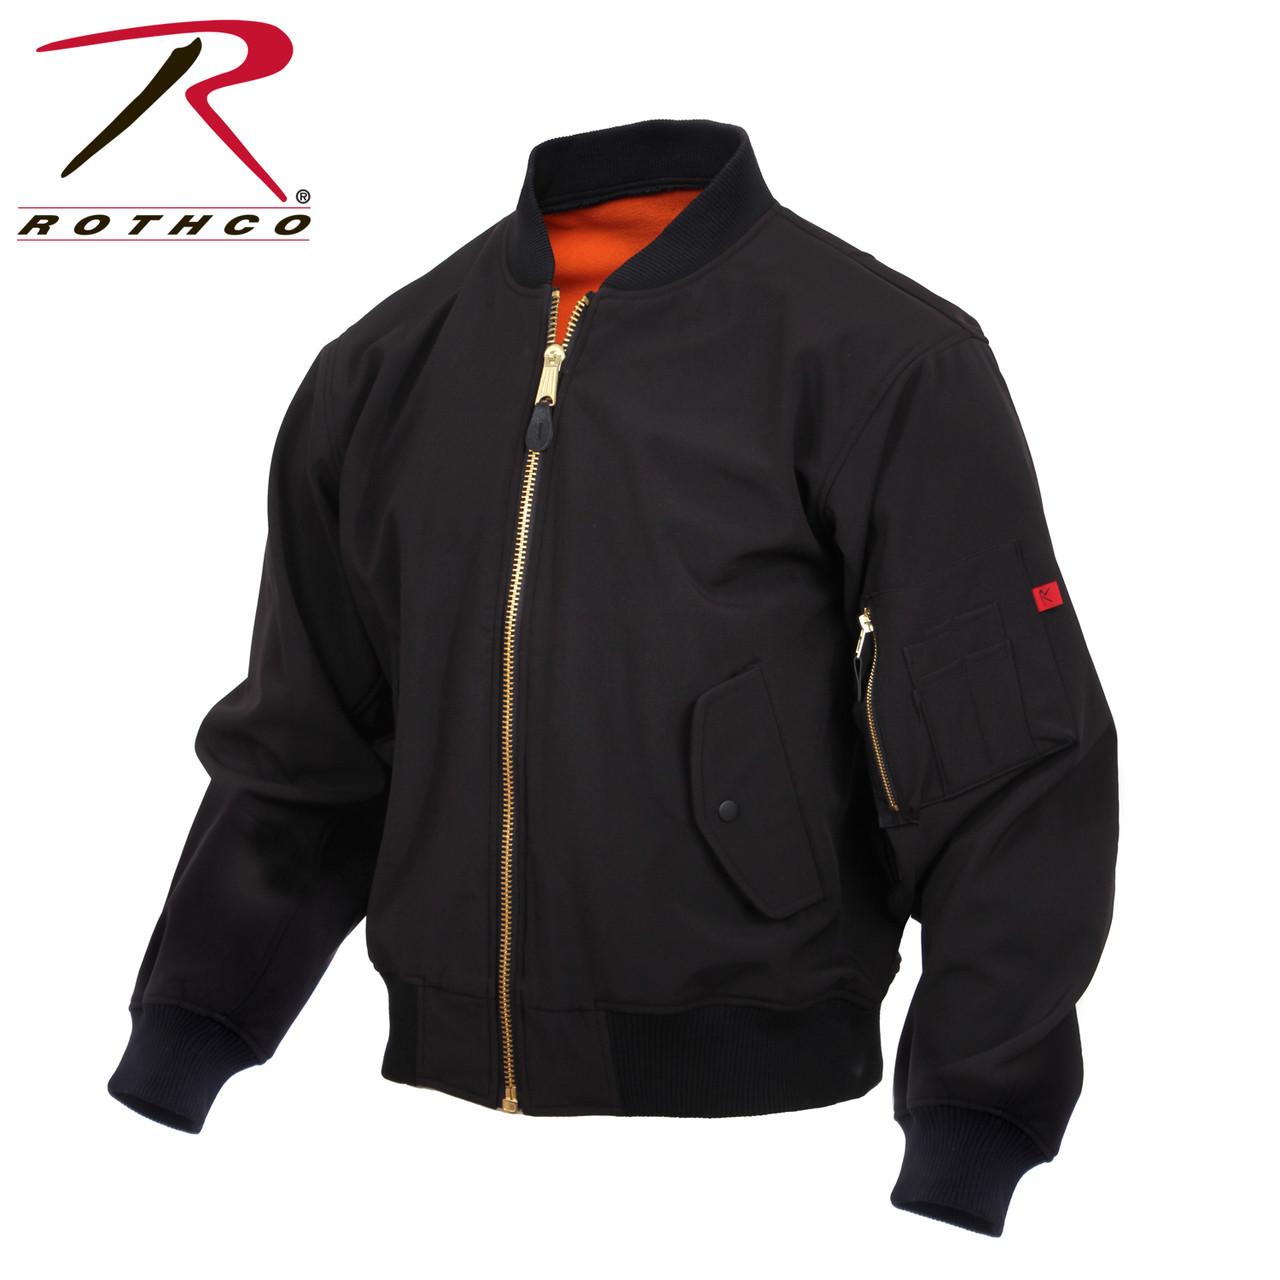 9f23f939abd38 Rothco Soft Shell MA-1 Flight Jacket - LMGS Online